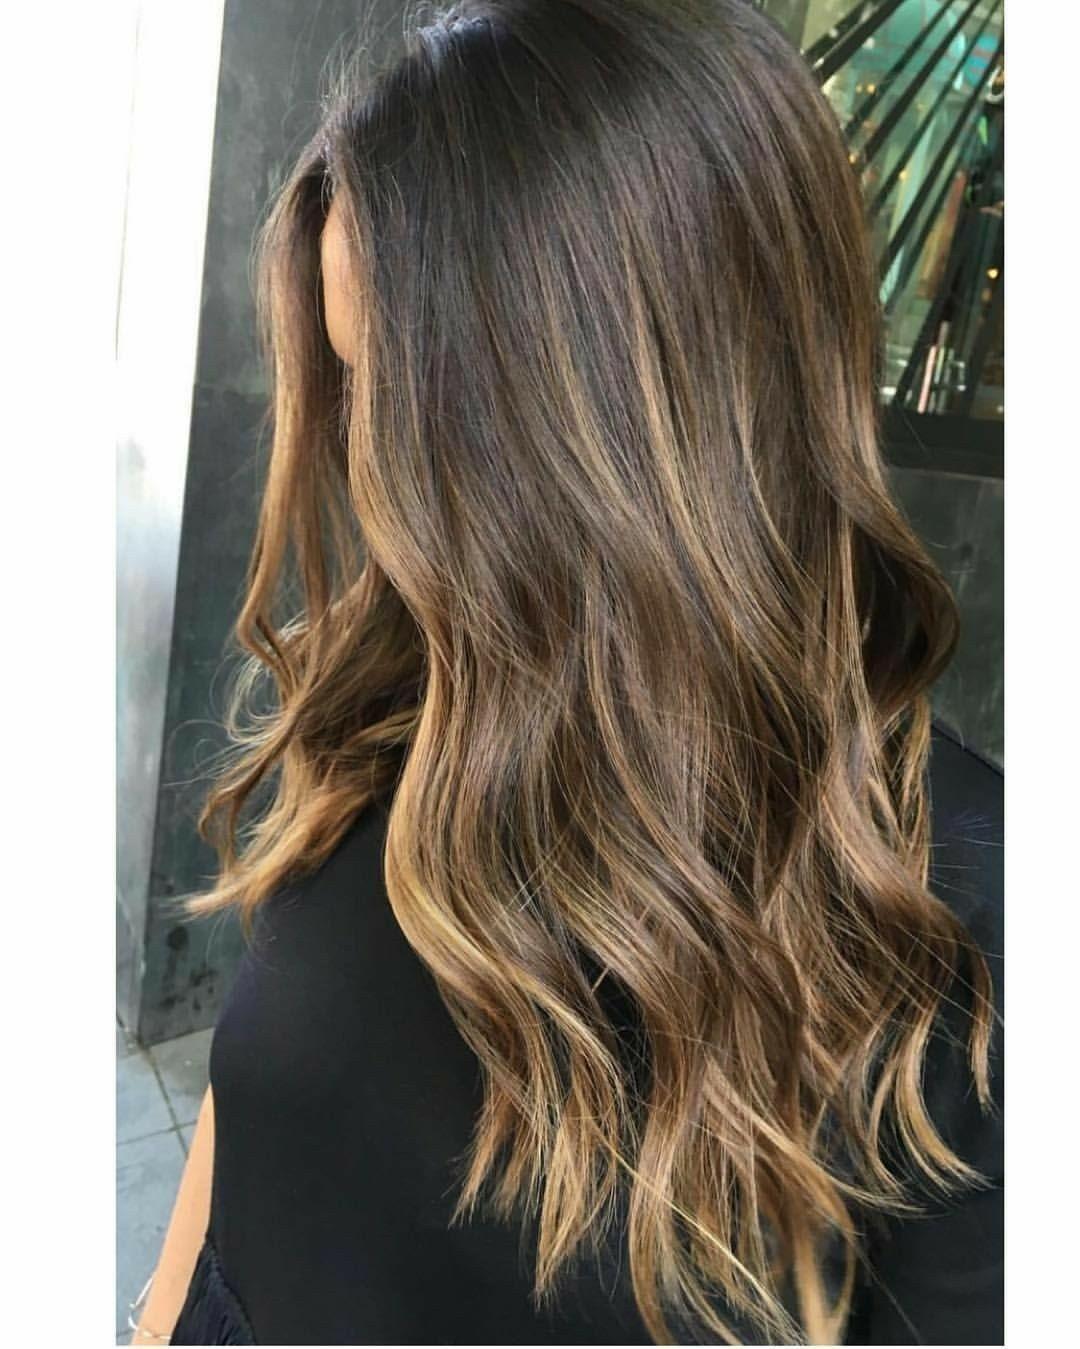 Hair Inspiration 2019-04-30 16:31:15